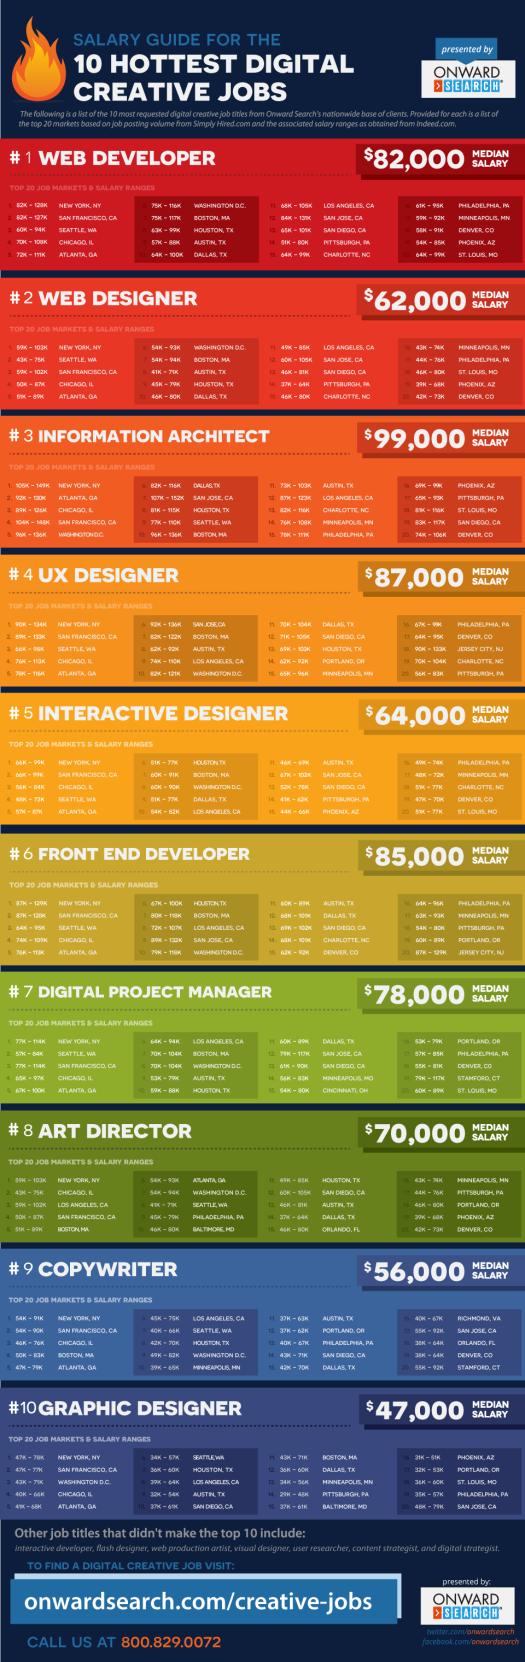 digital-creative-jobs-salary-guide